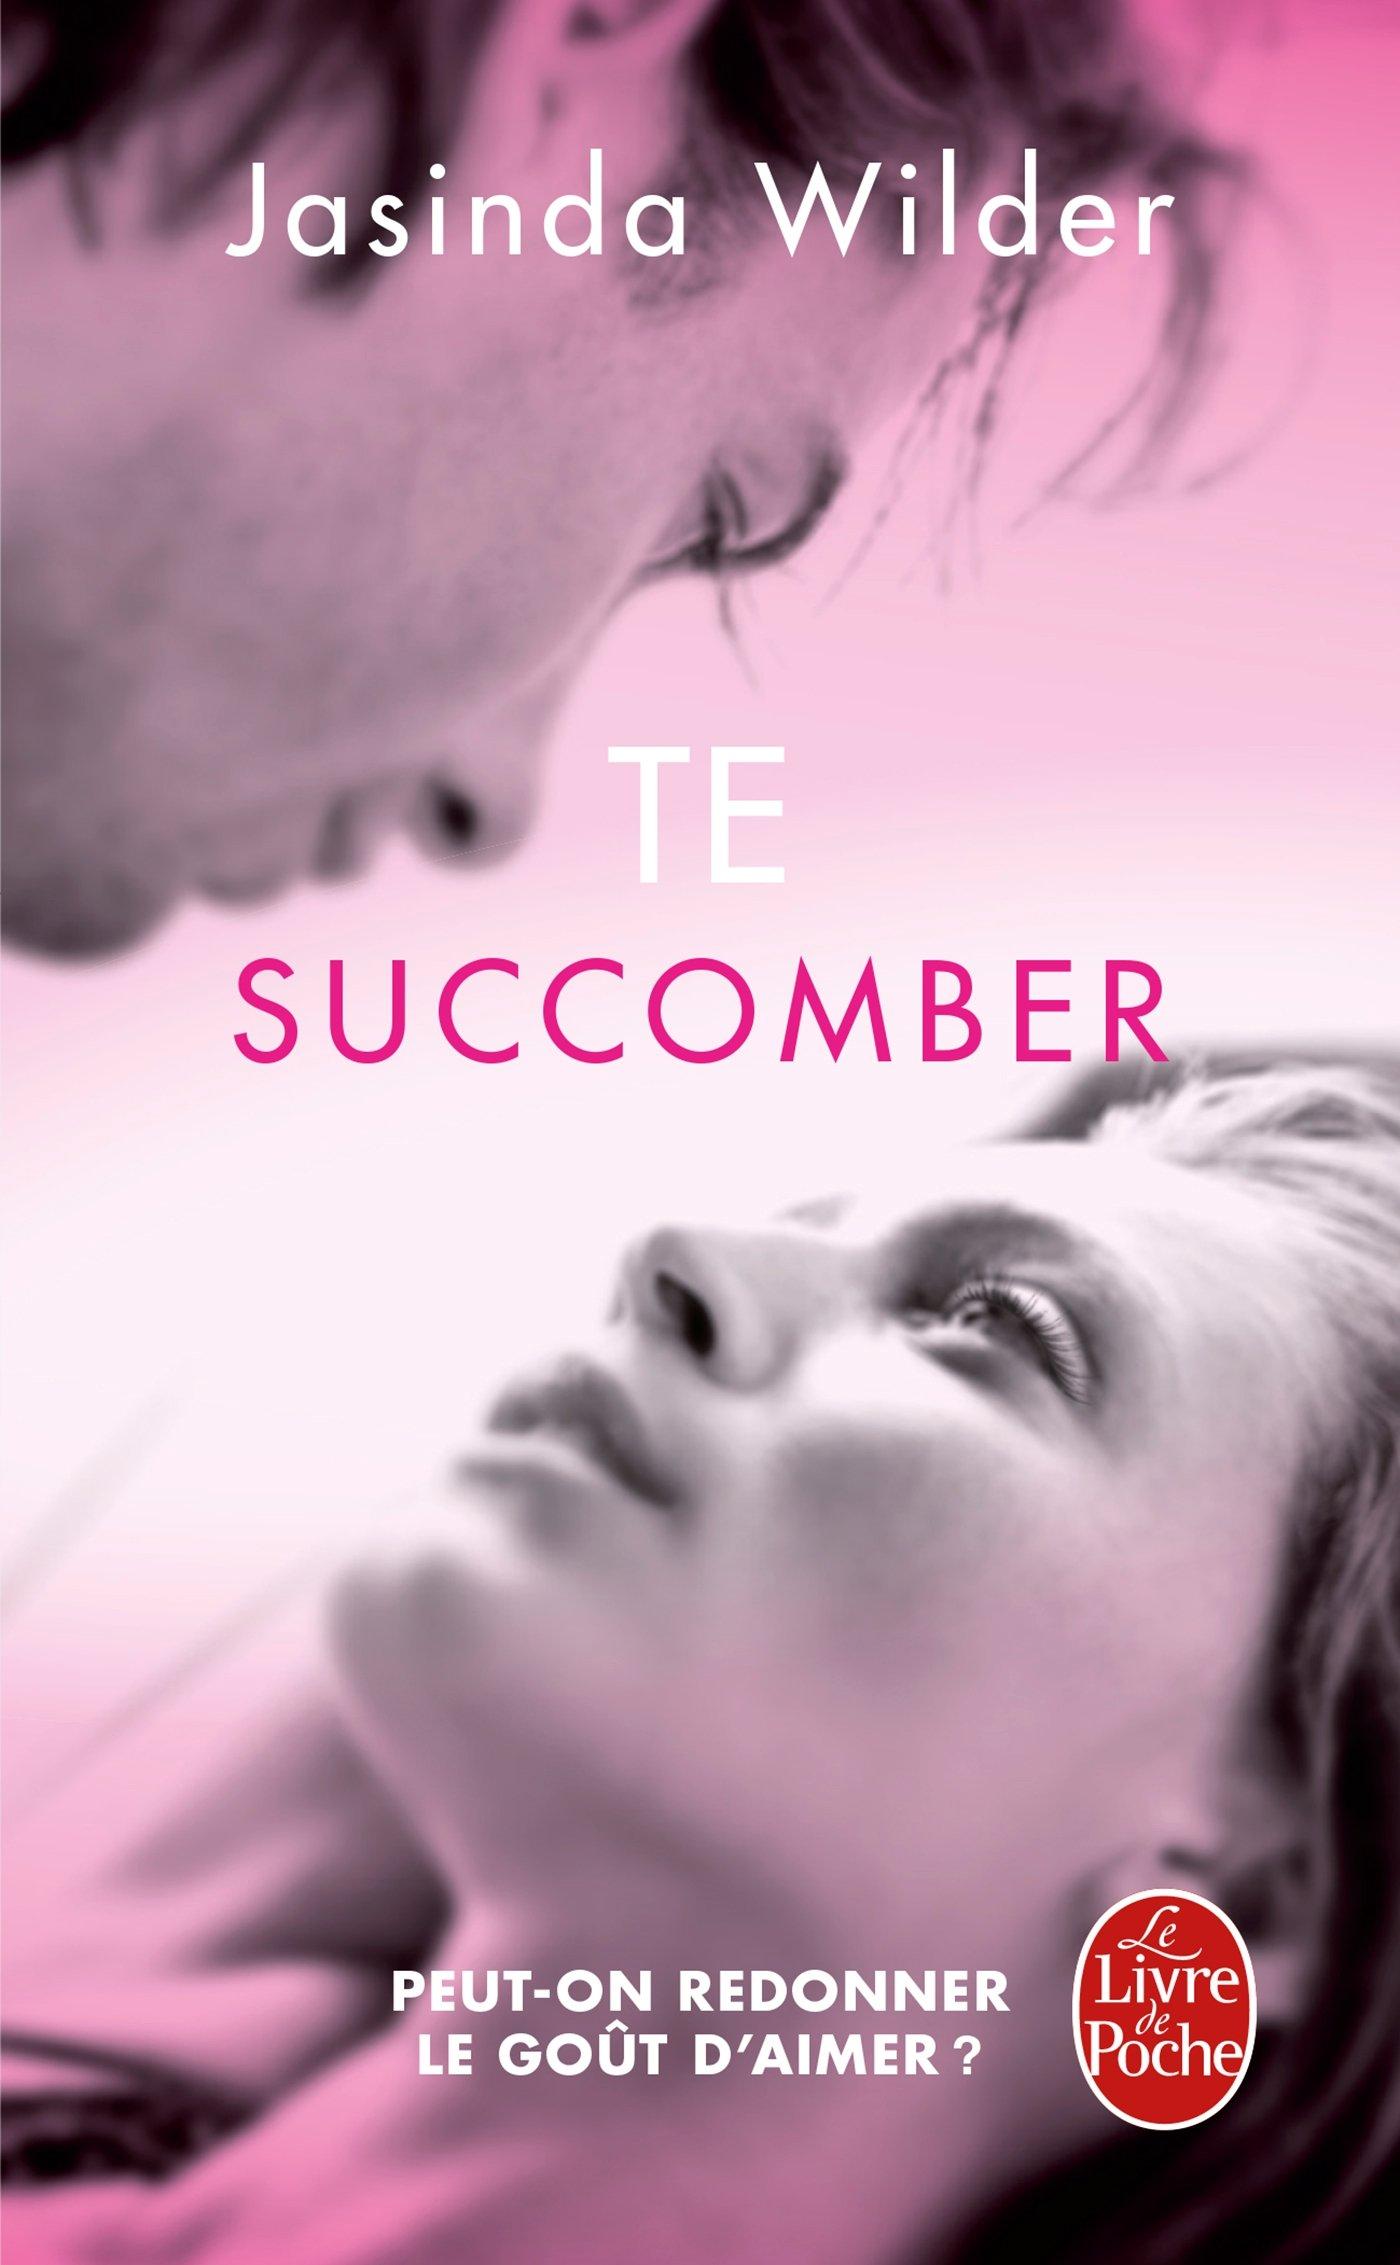 TE SUCCOMBER DE JASINDA WILDER PDF